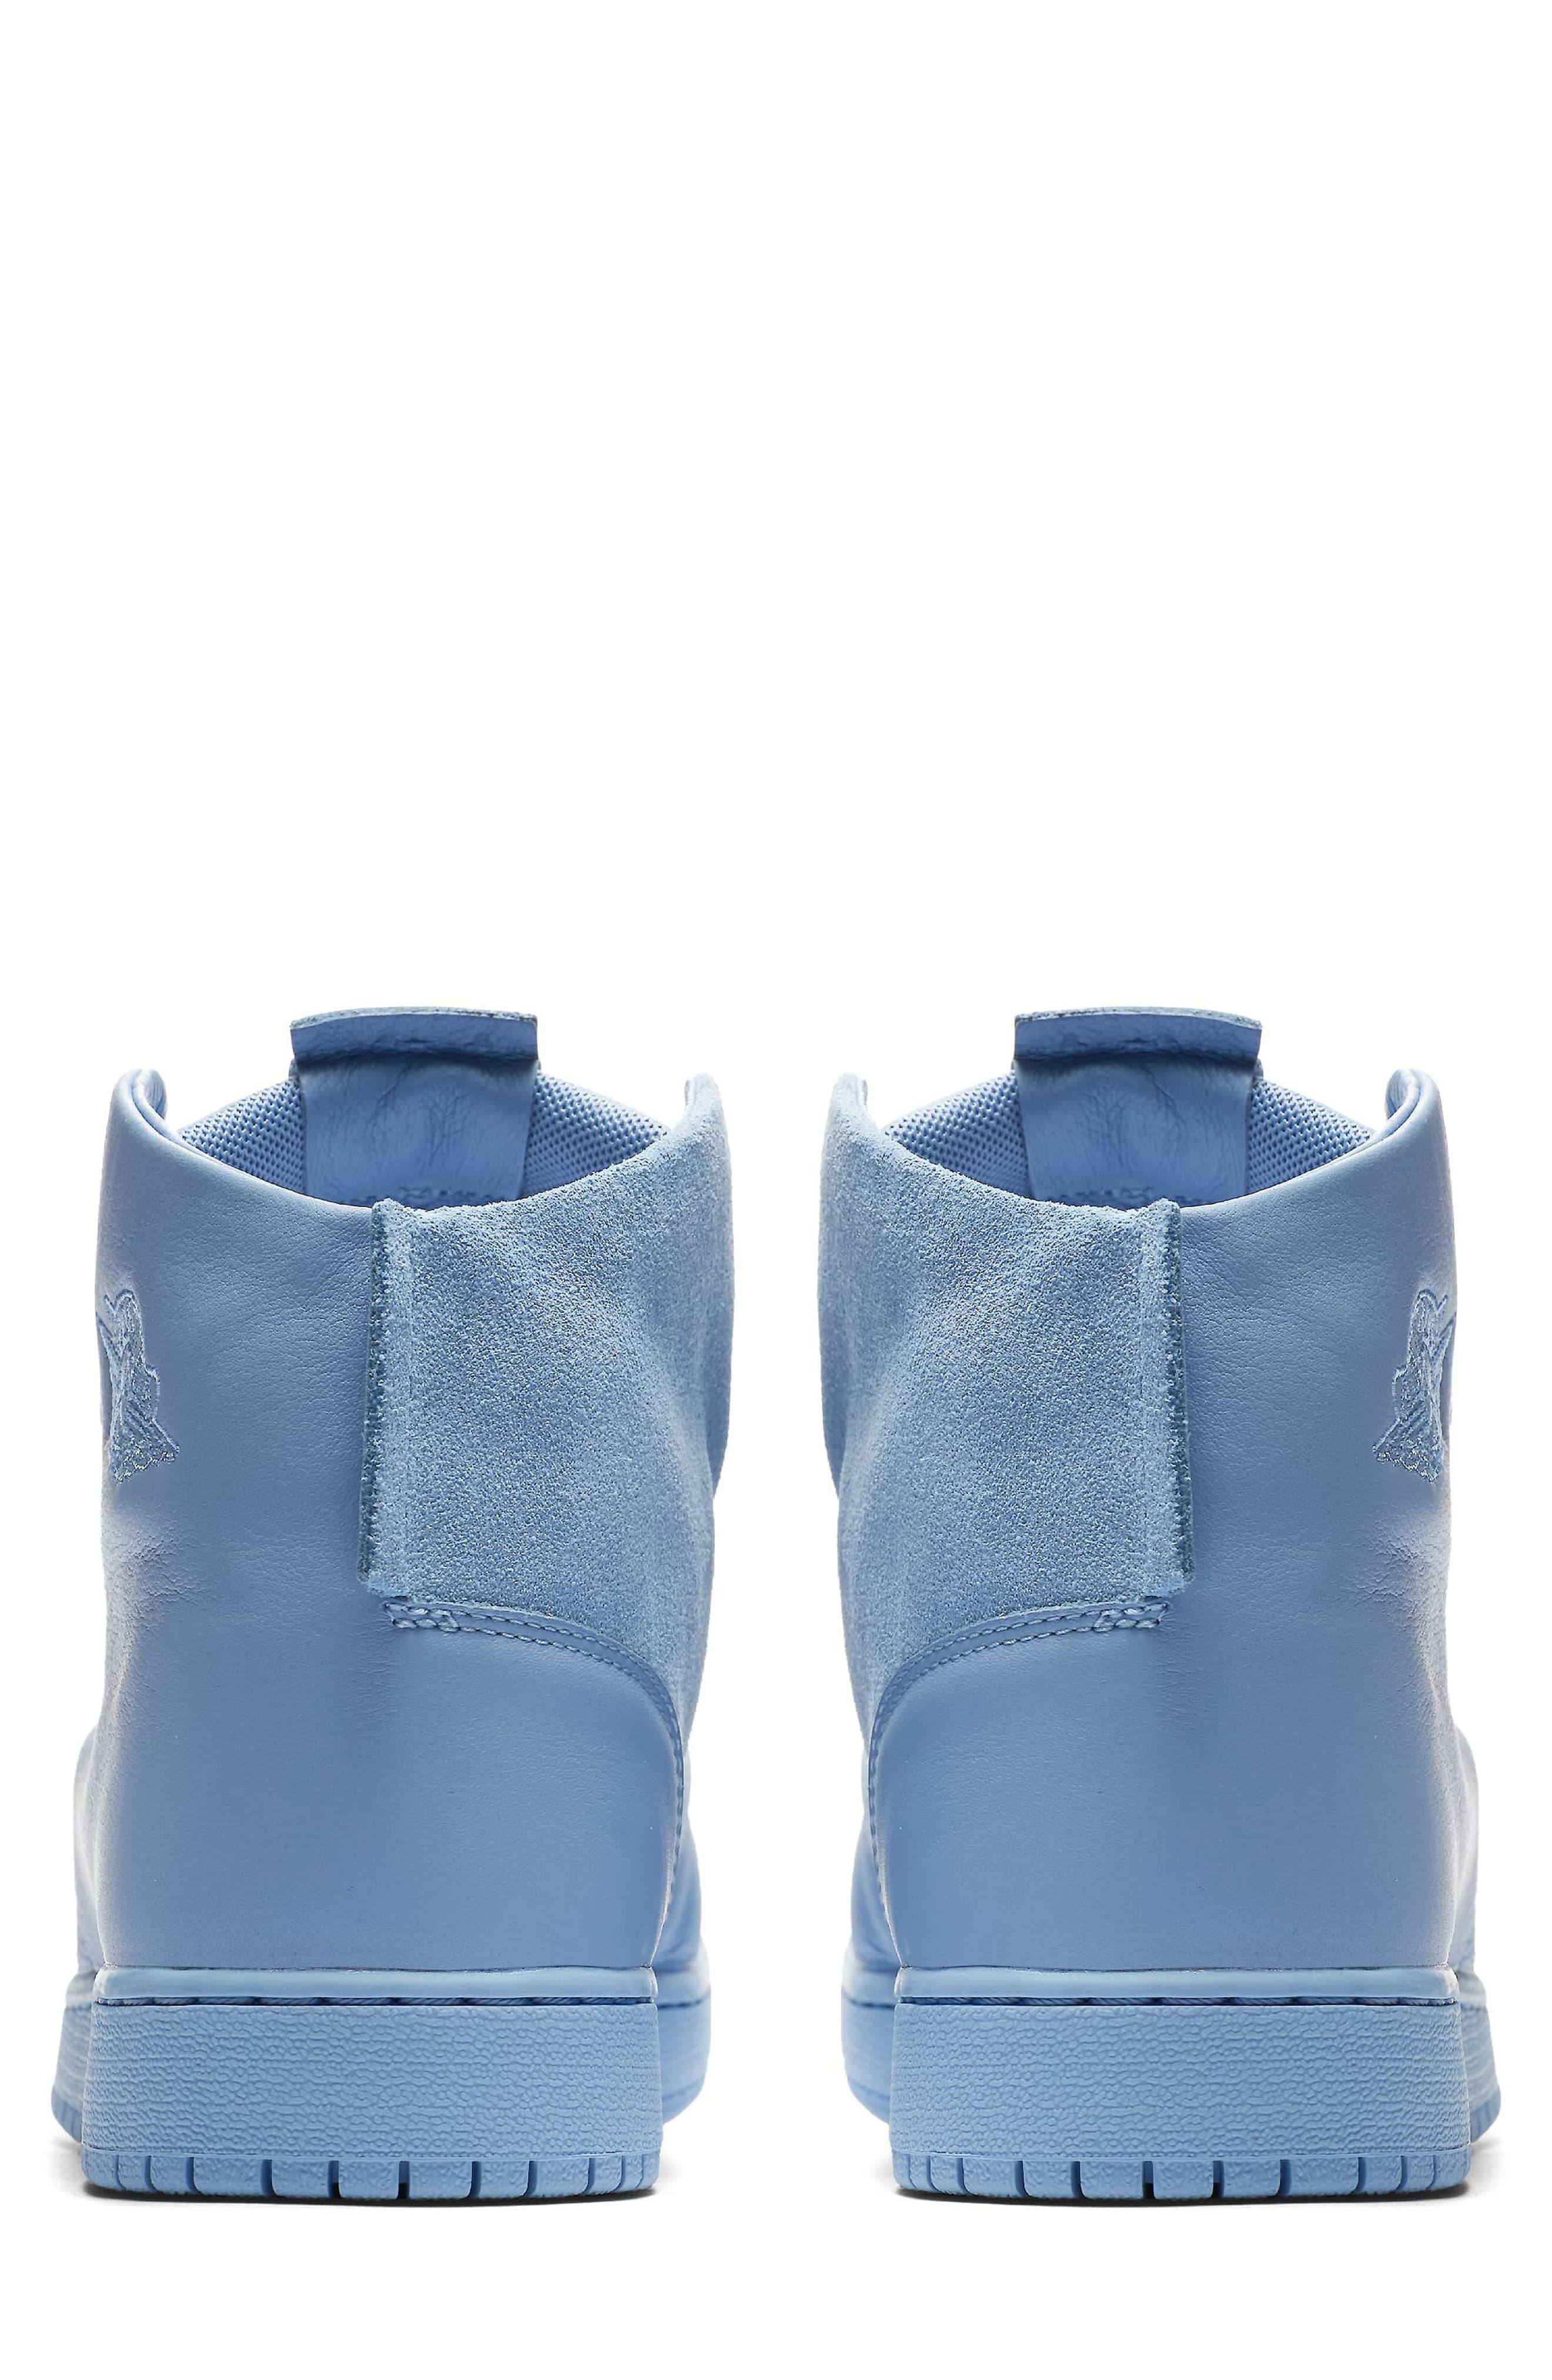 Air Jordan 1 Sage XX High Top Sneaker,                             Alternate thumbnail 2, color,                             Light Blue